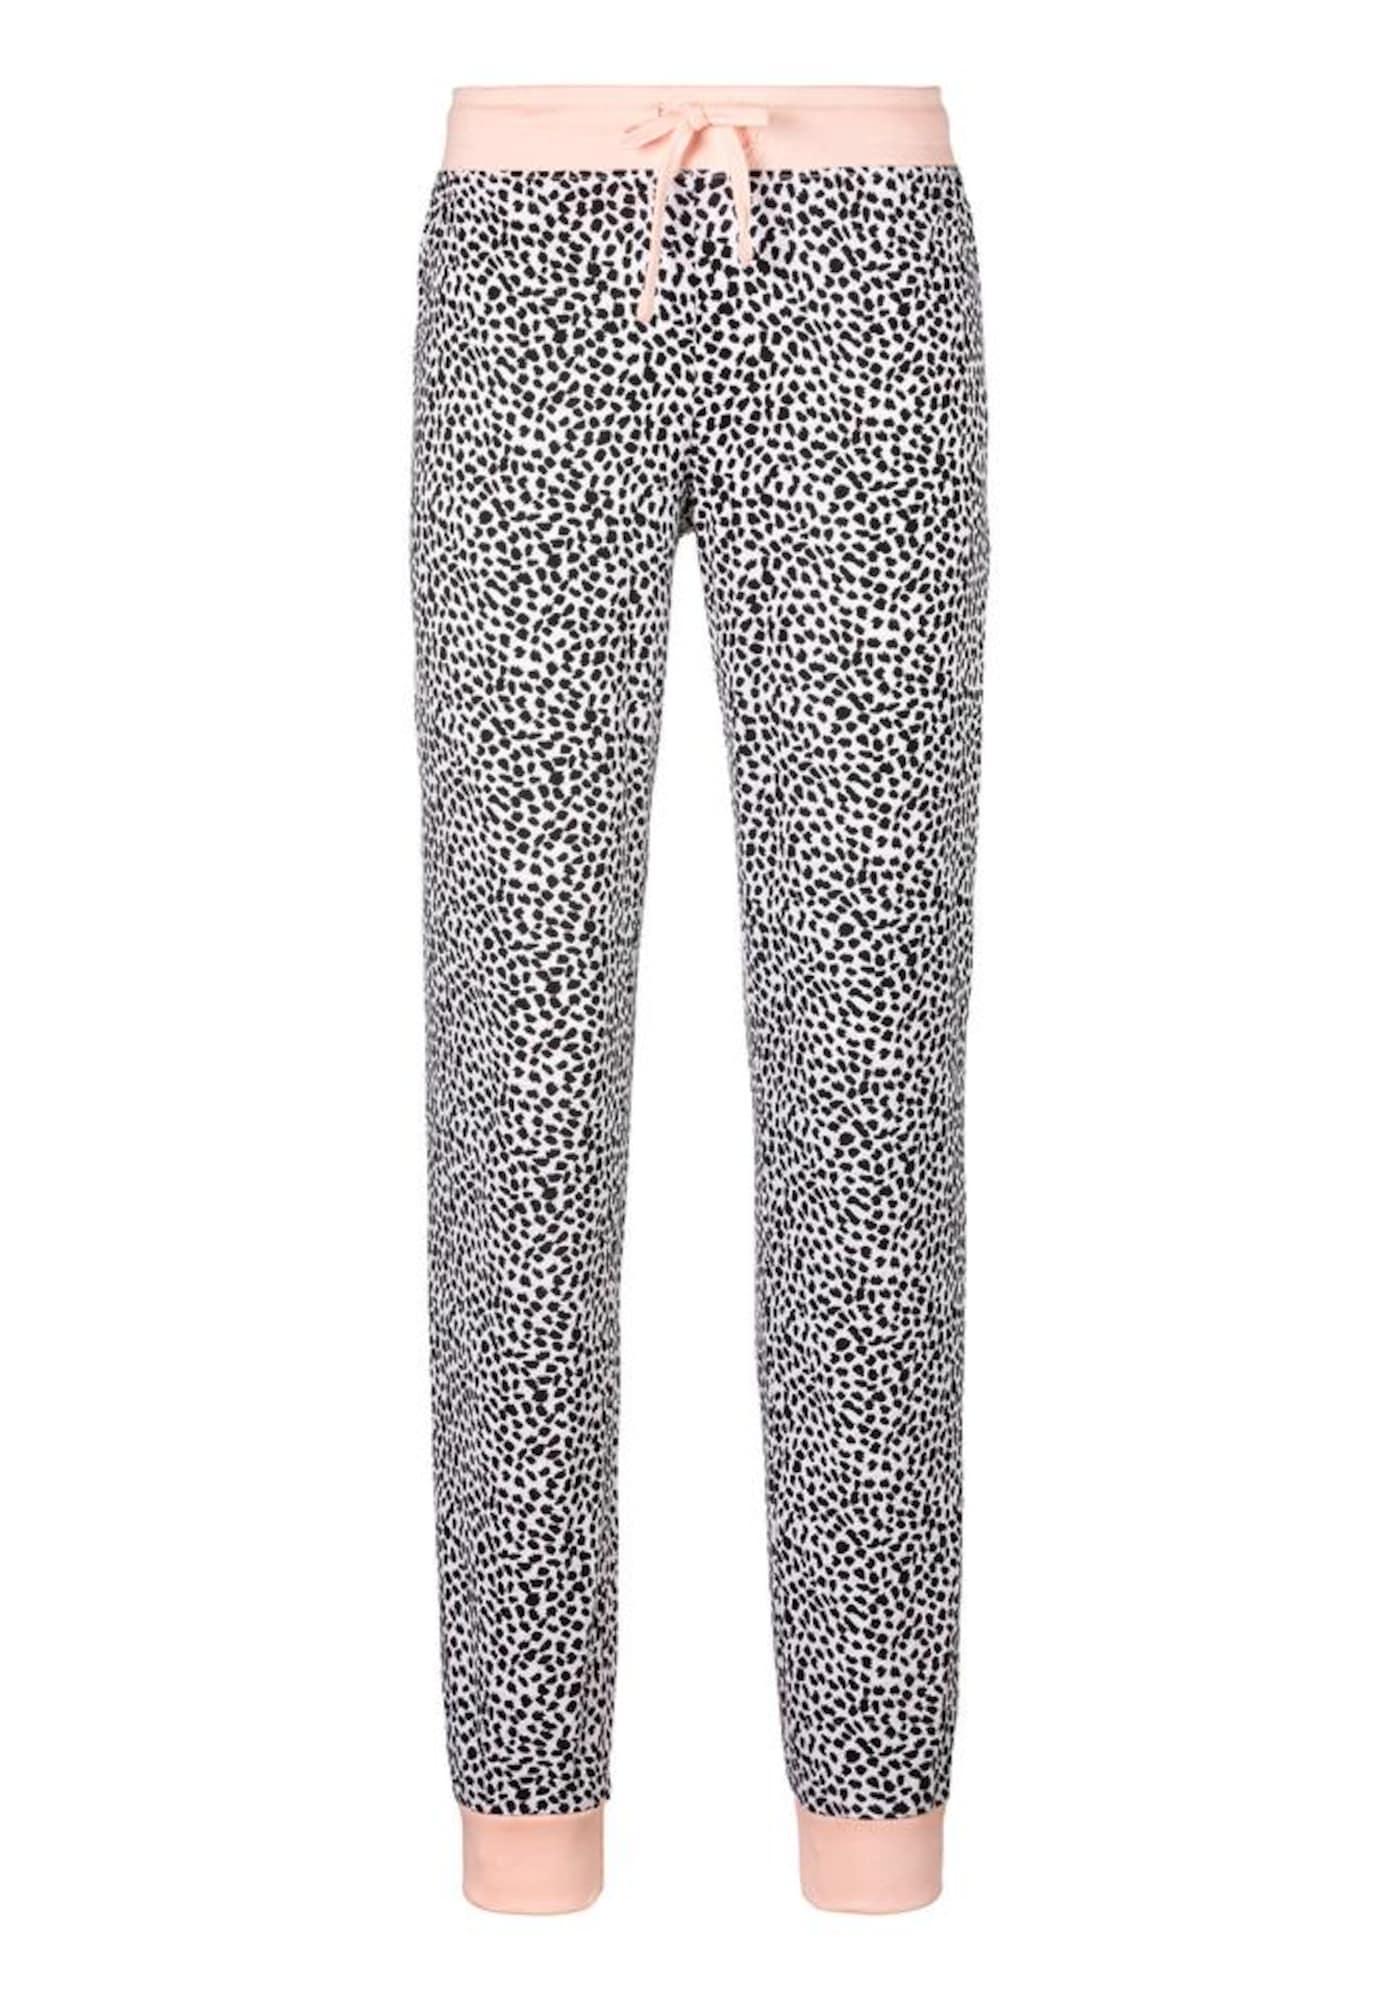 VIVANCE Pantalon de pyjama  - Noir - Taille: XXS-XS - female